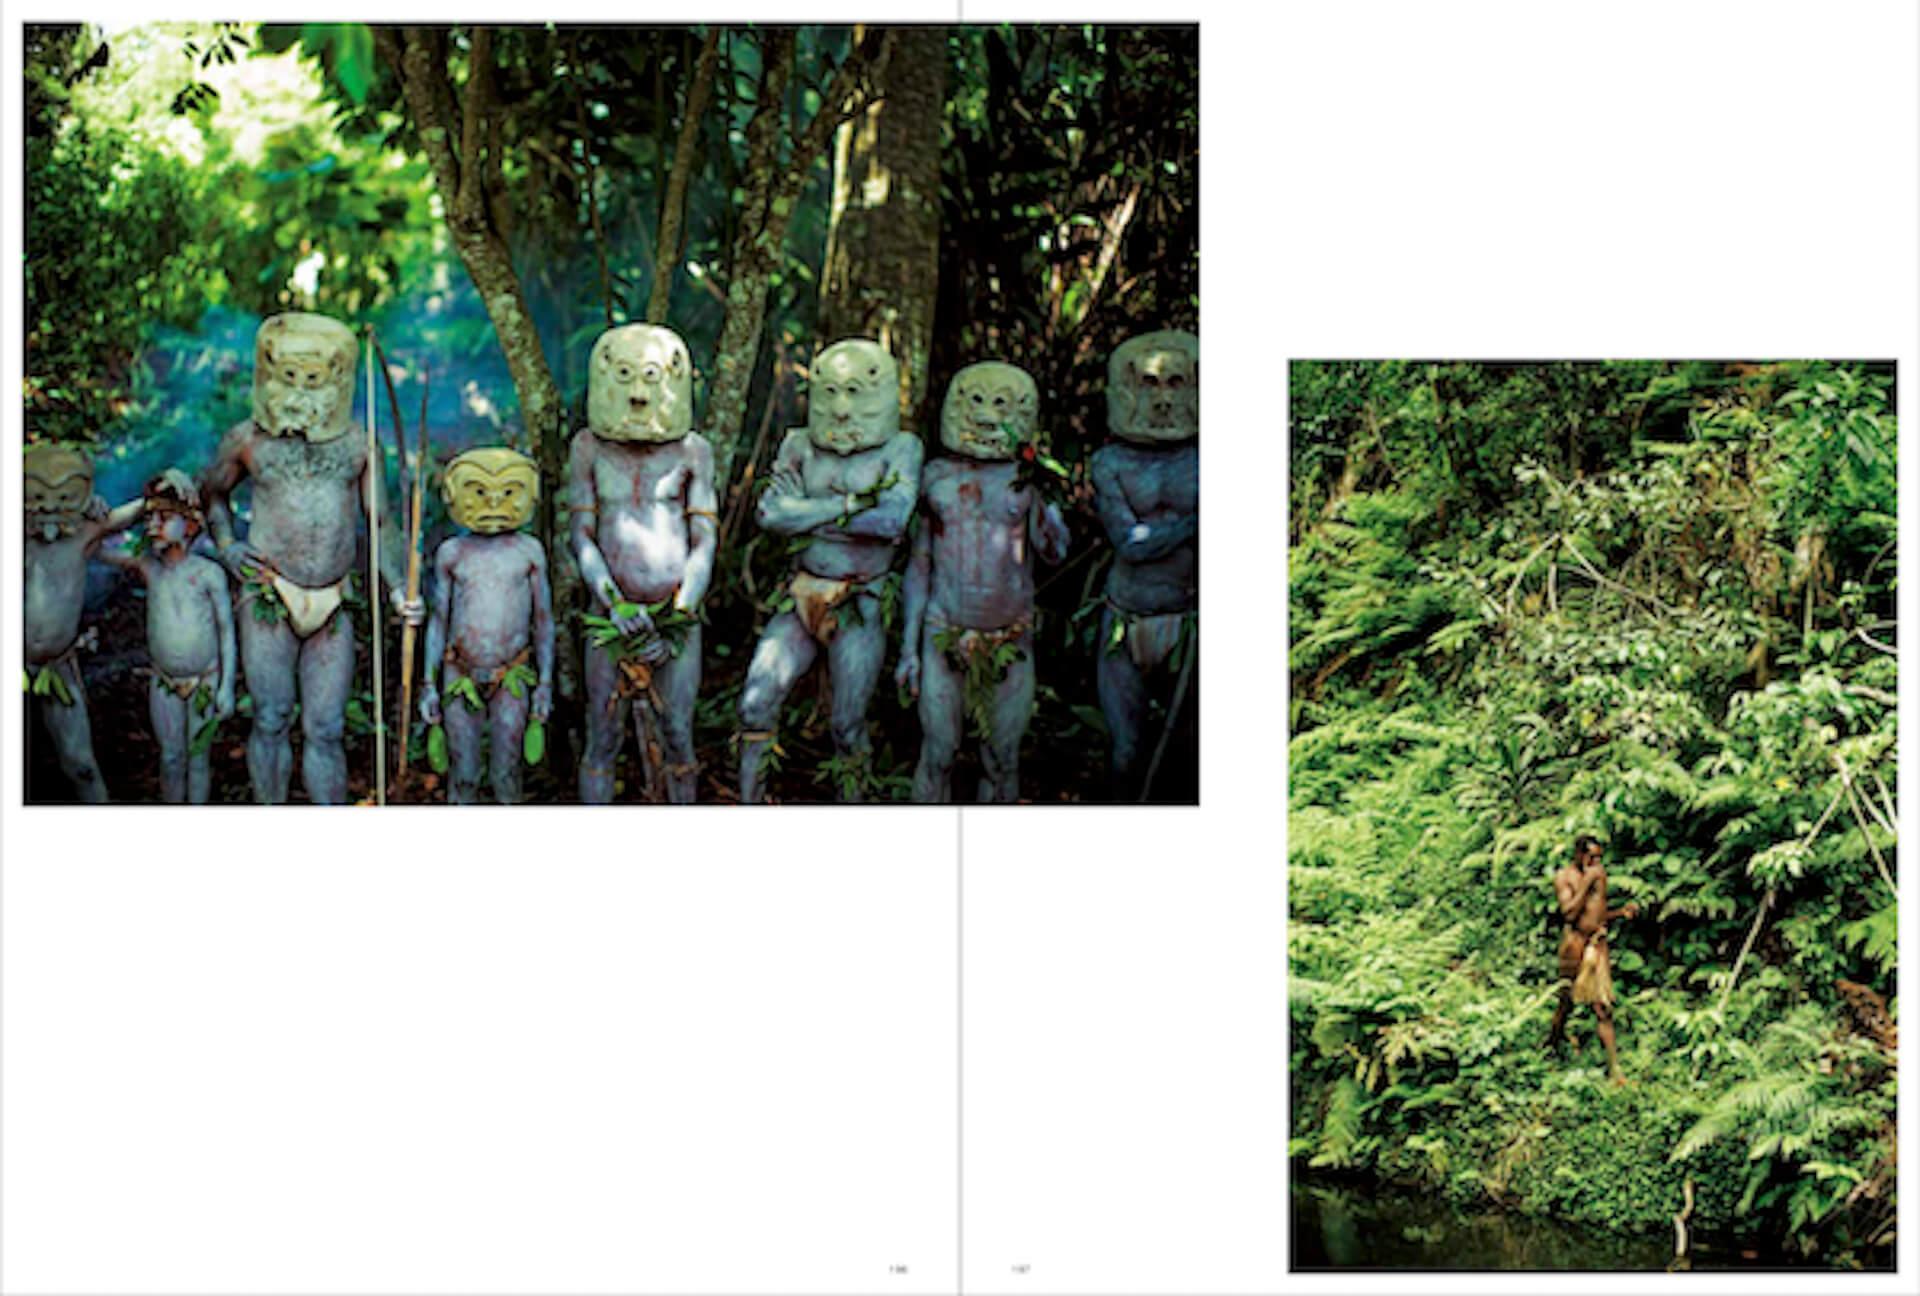 『TRANSIT』の10年超の歩みが2冊の写真集に!企画展<光の記憶- Through our habitat>も開催 art191029_transit_6